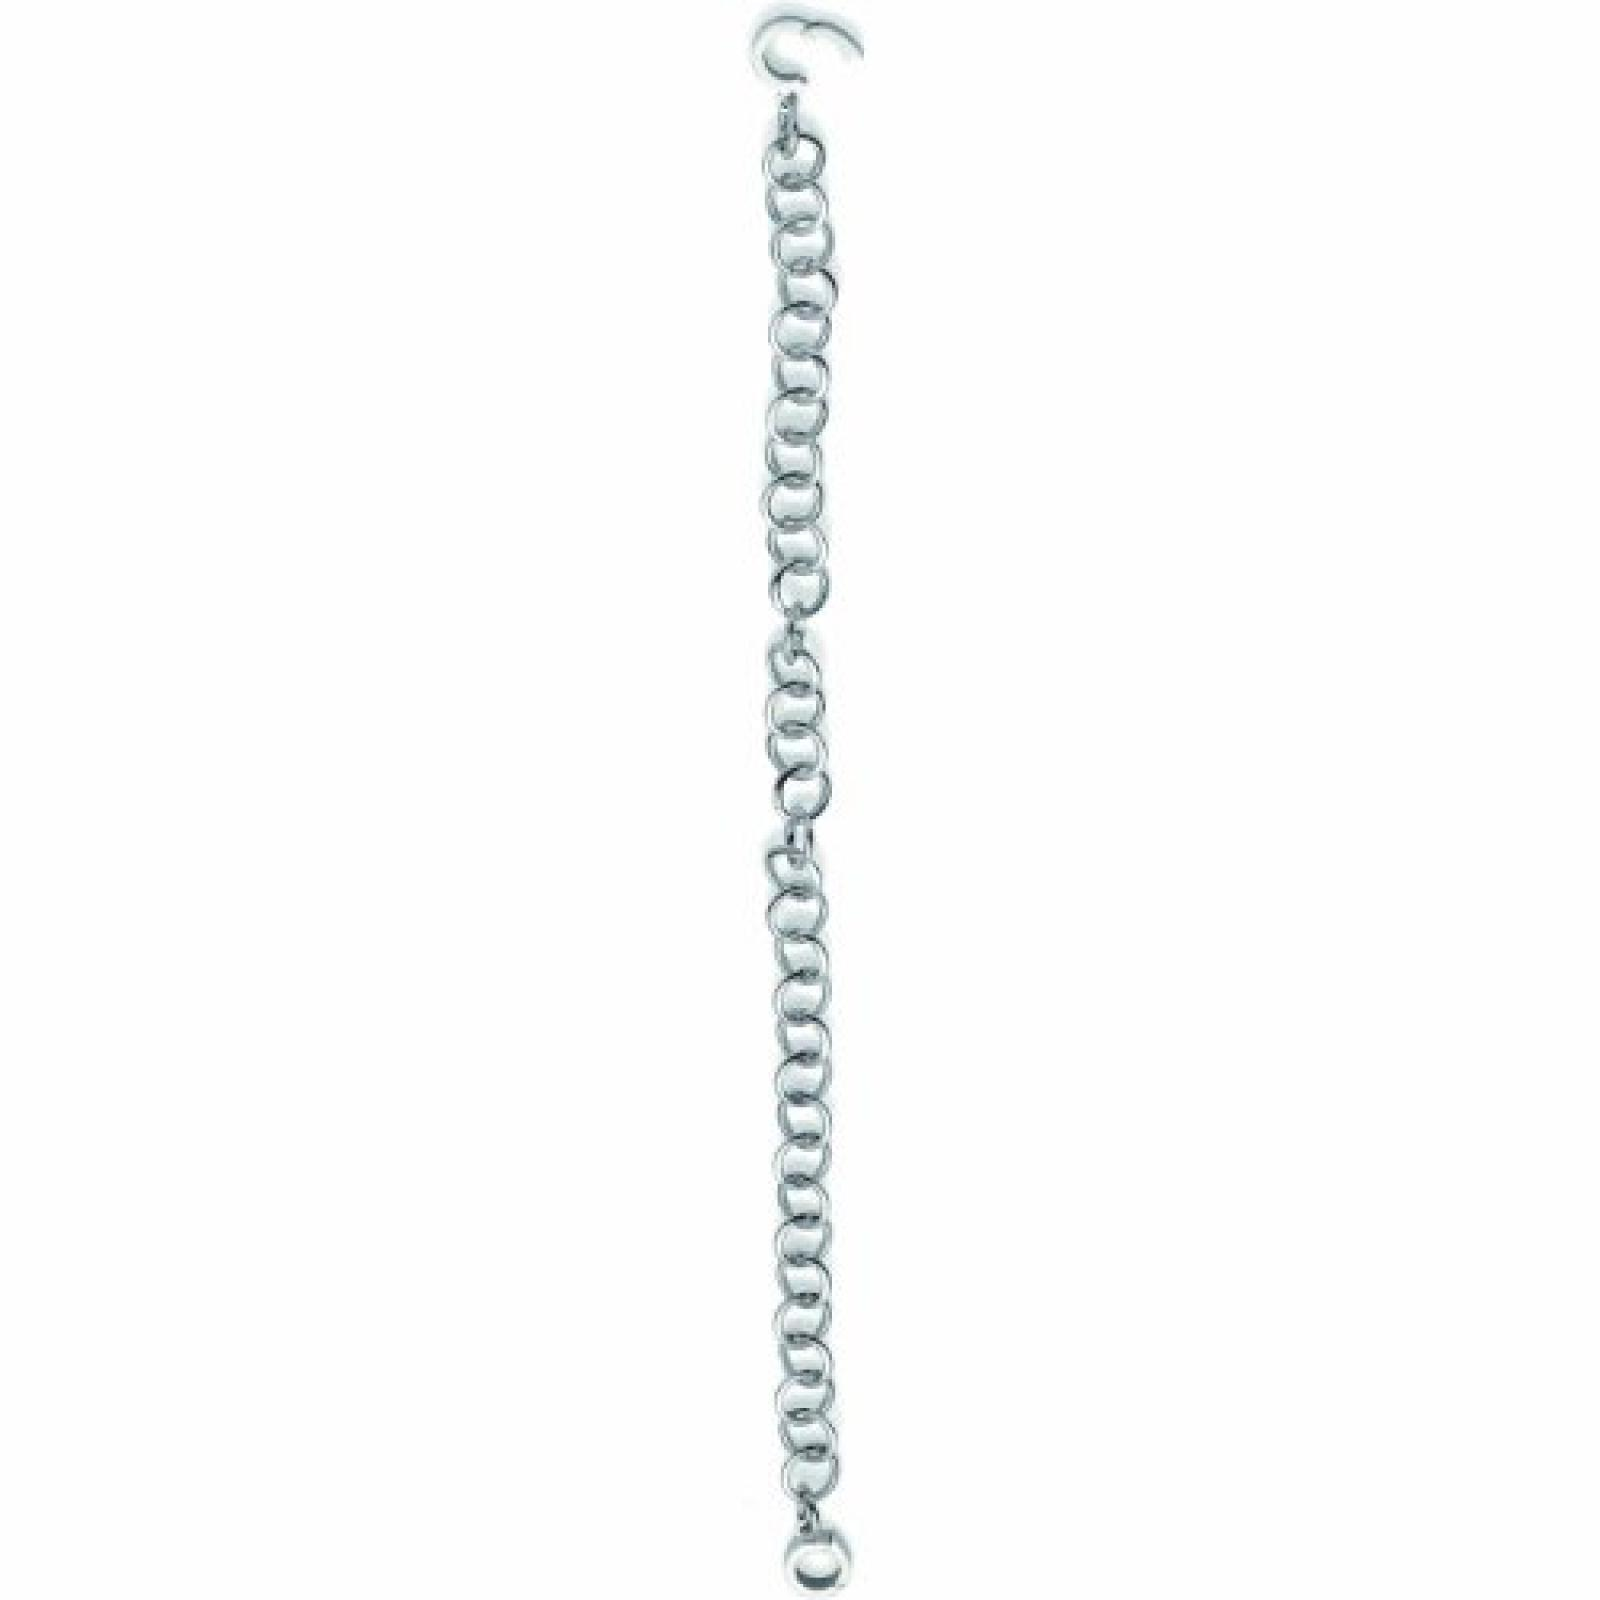 Leonardo Jewels Damen-Charmskette Edelstahl Verlängerungs Darlins 27cm 11704